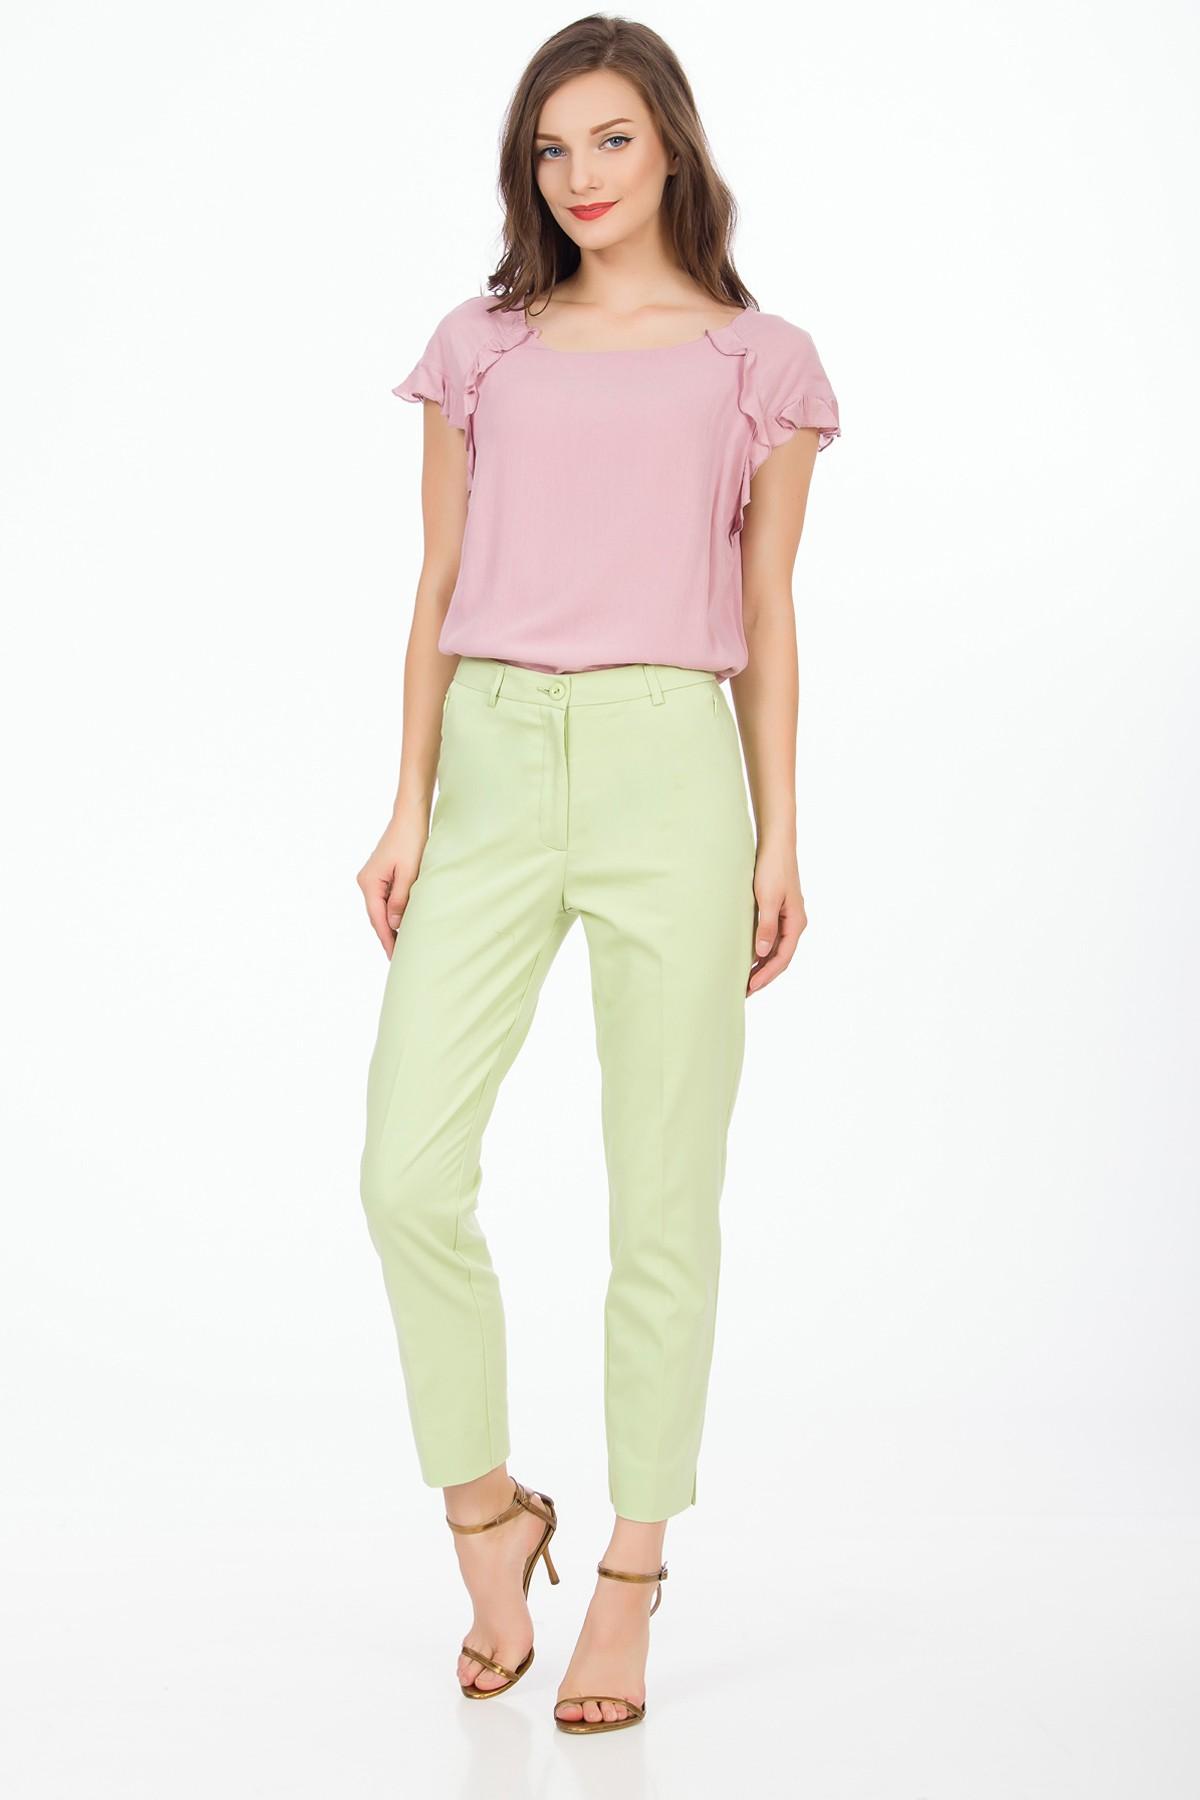 pantaloni-verzi-sense